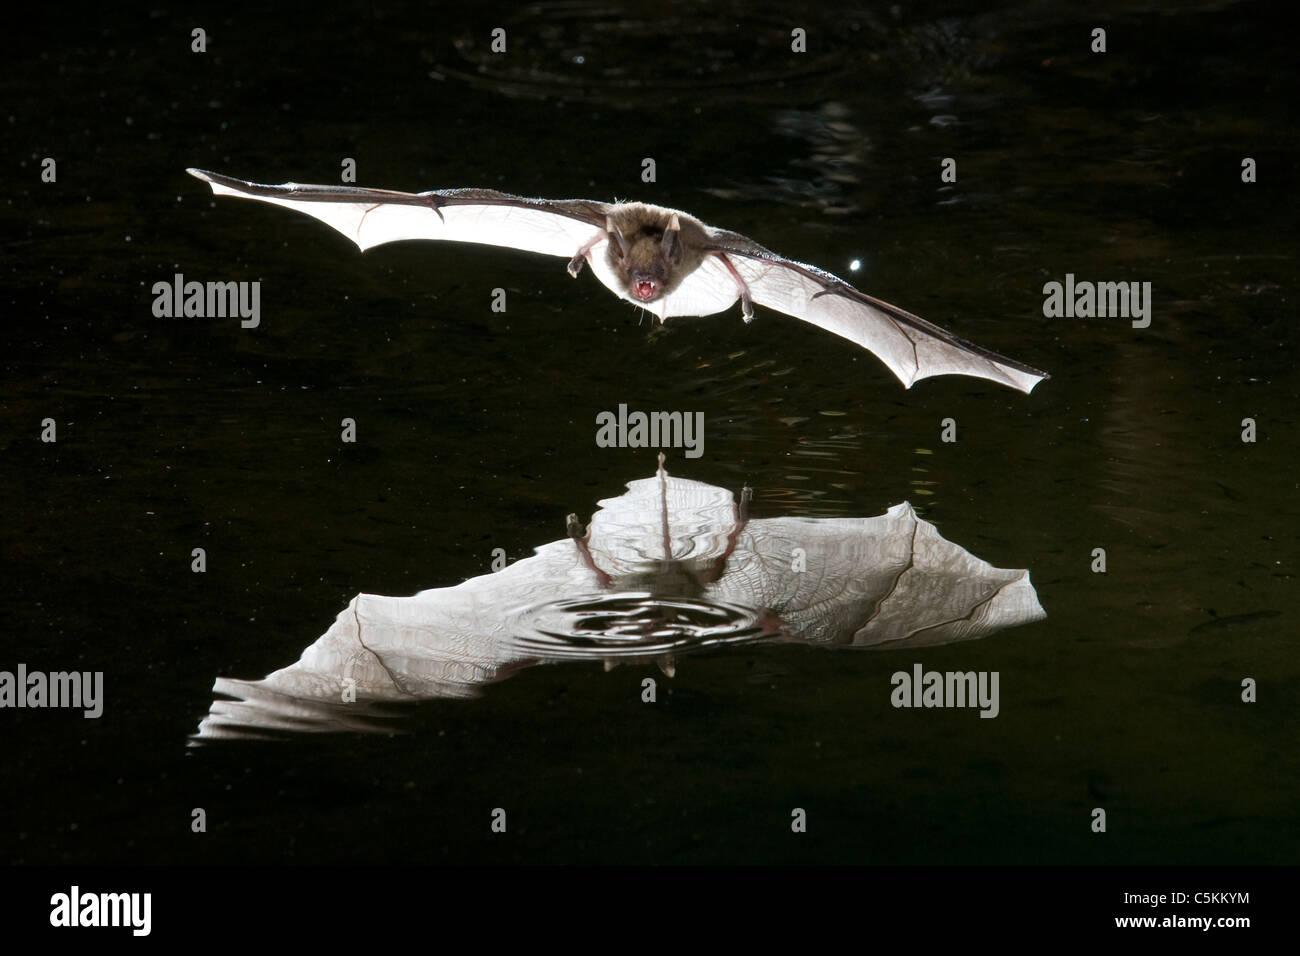 Bat in flight hunting over pond Southwestern United States - Stock Image